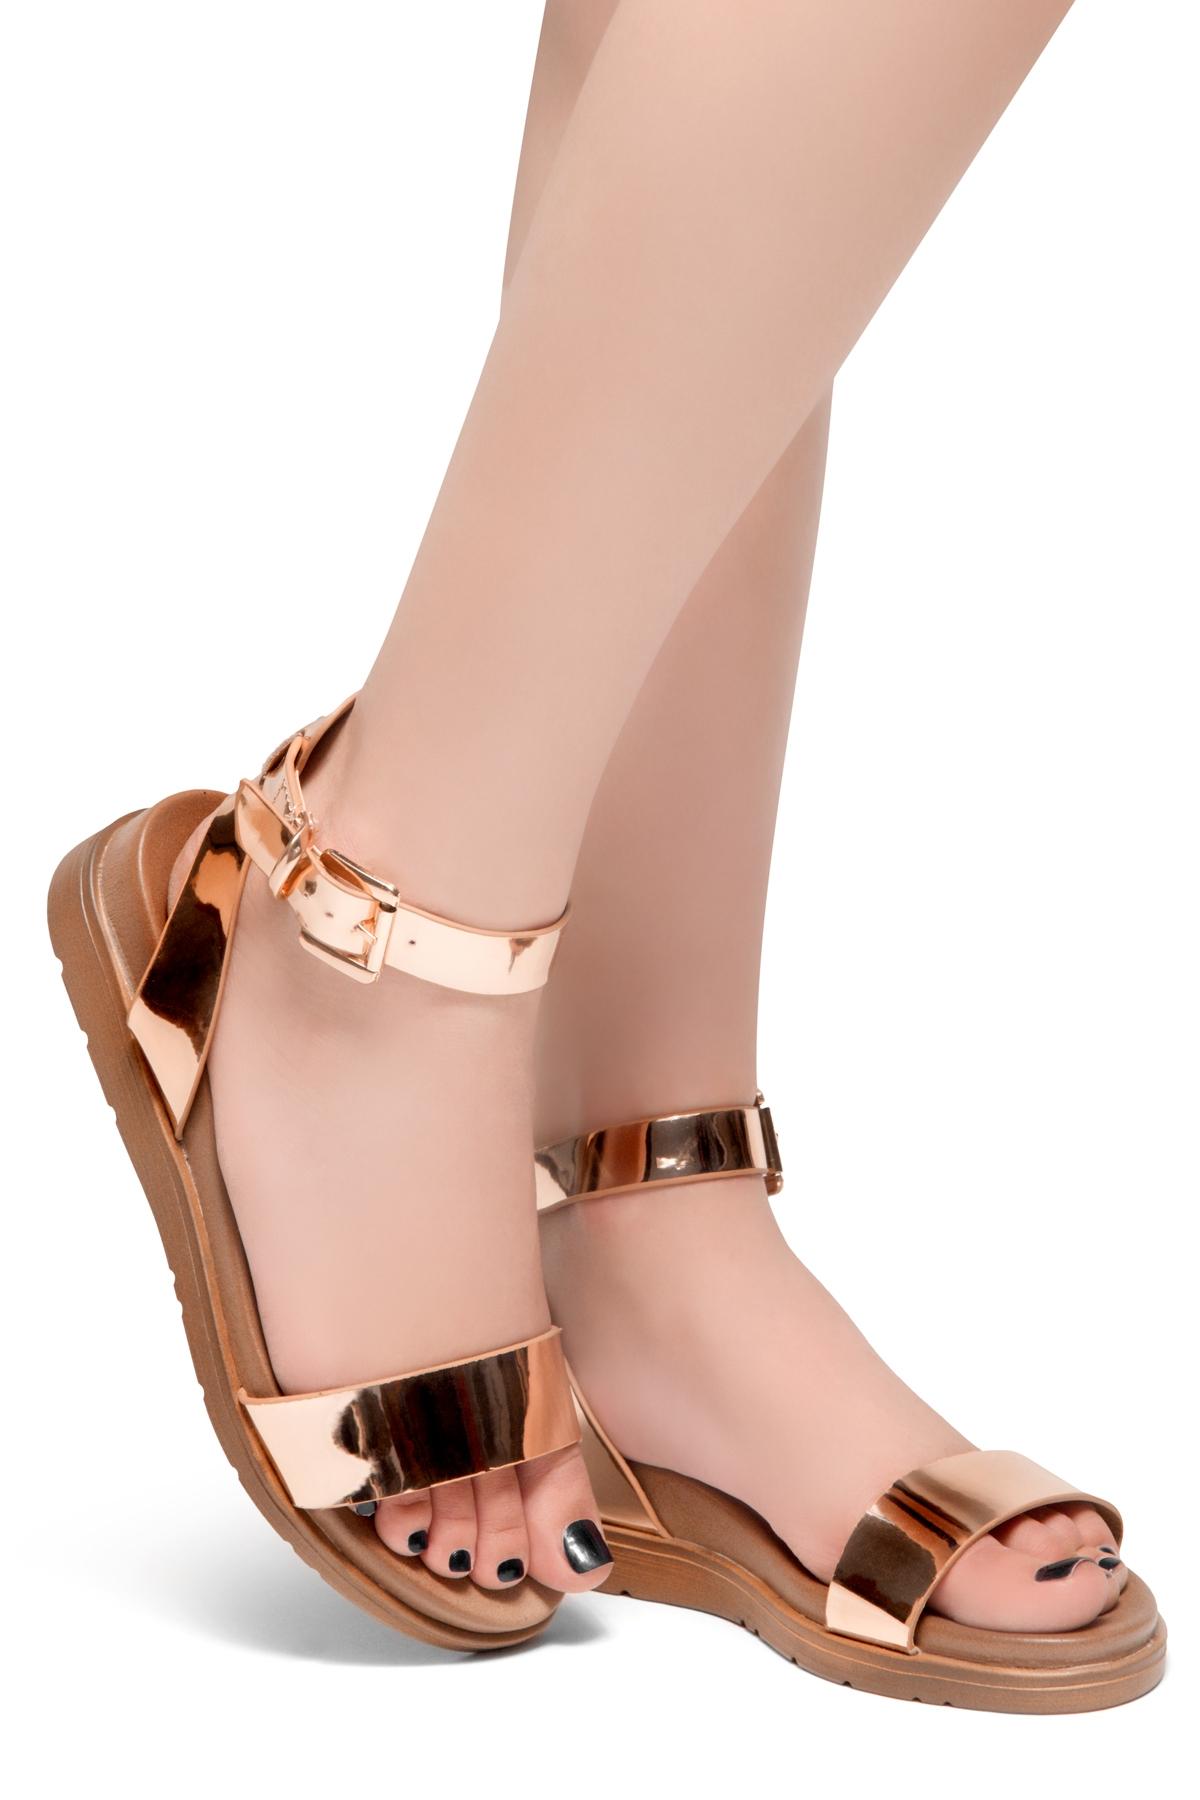 Herstyle Flat Platform Sandalrosegold Me Ankle Strap Needed RqjL5A43